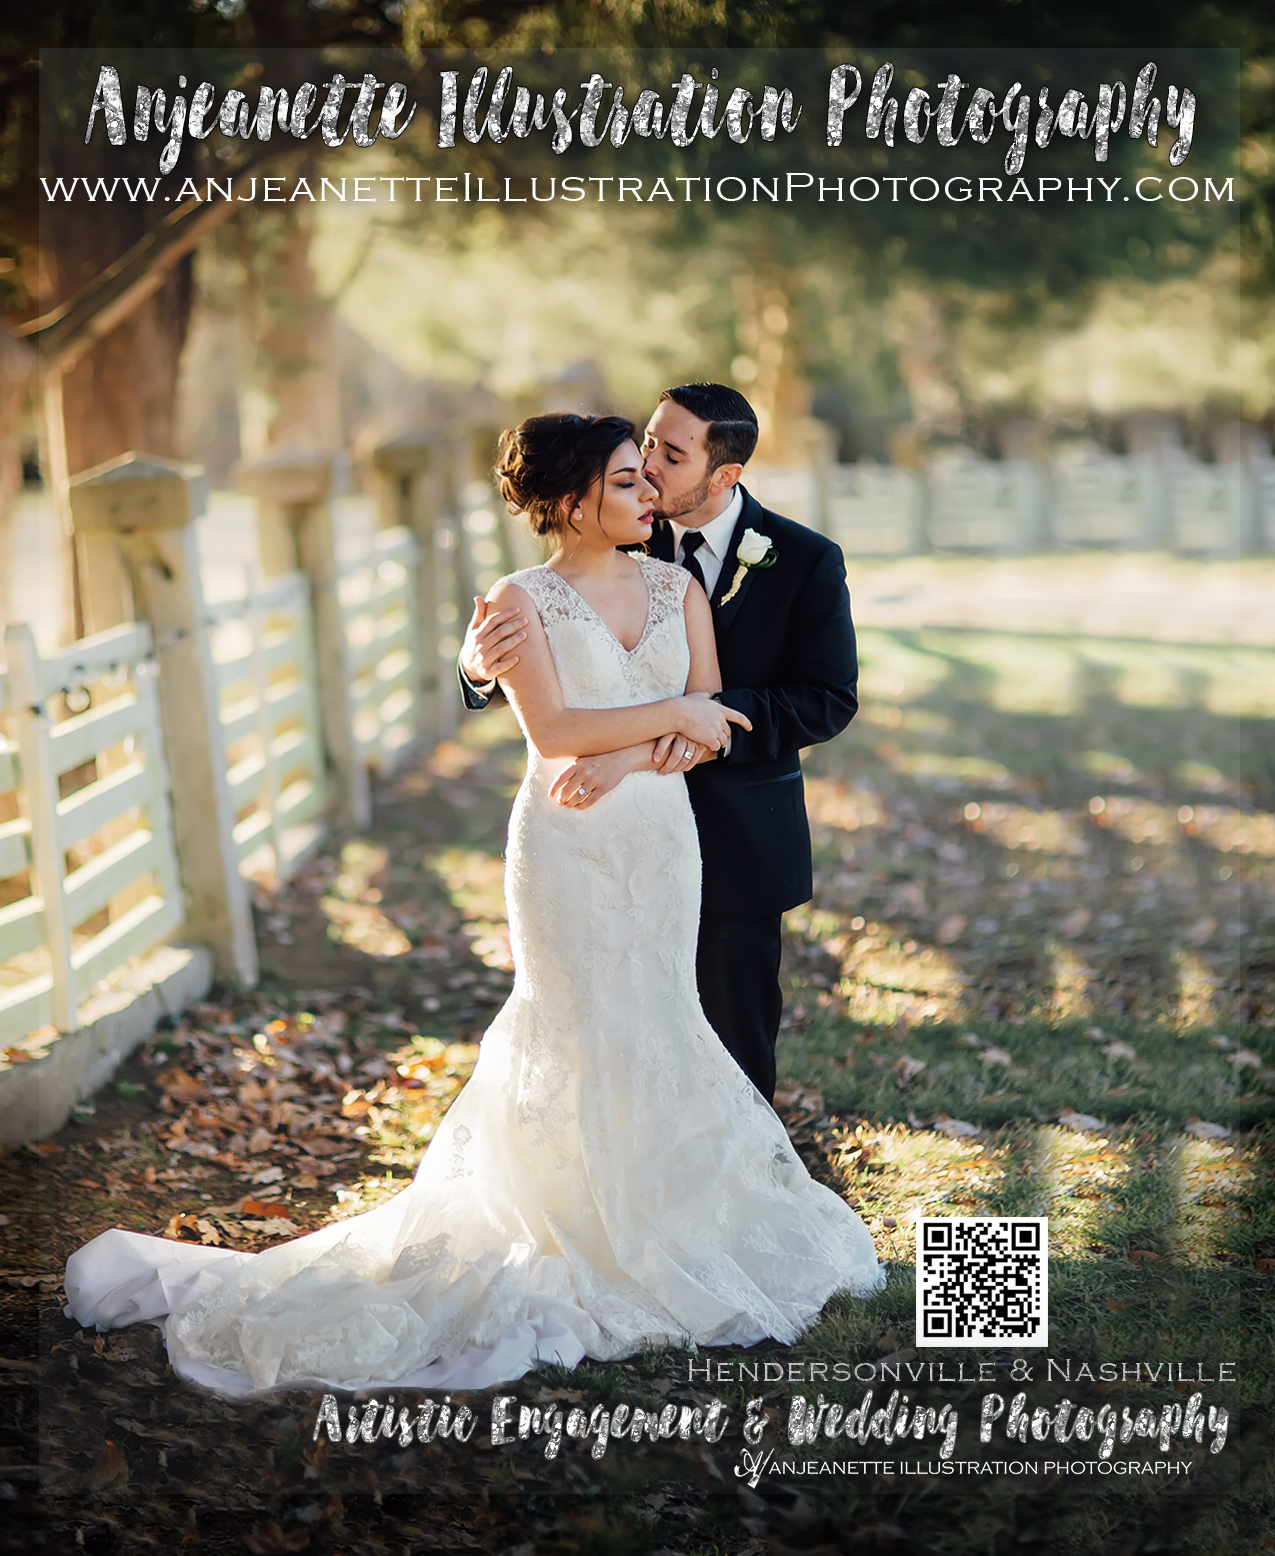 Sumner County Wedding 37075 Photographer anjeanette Illustration Photography